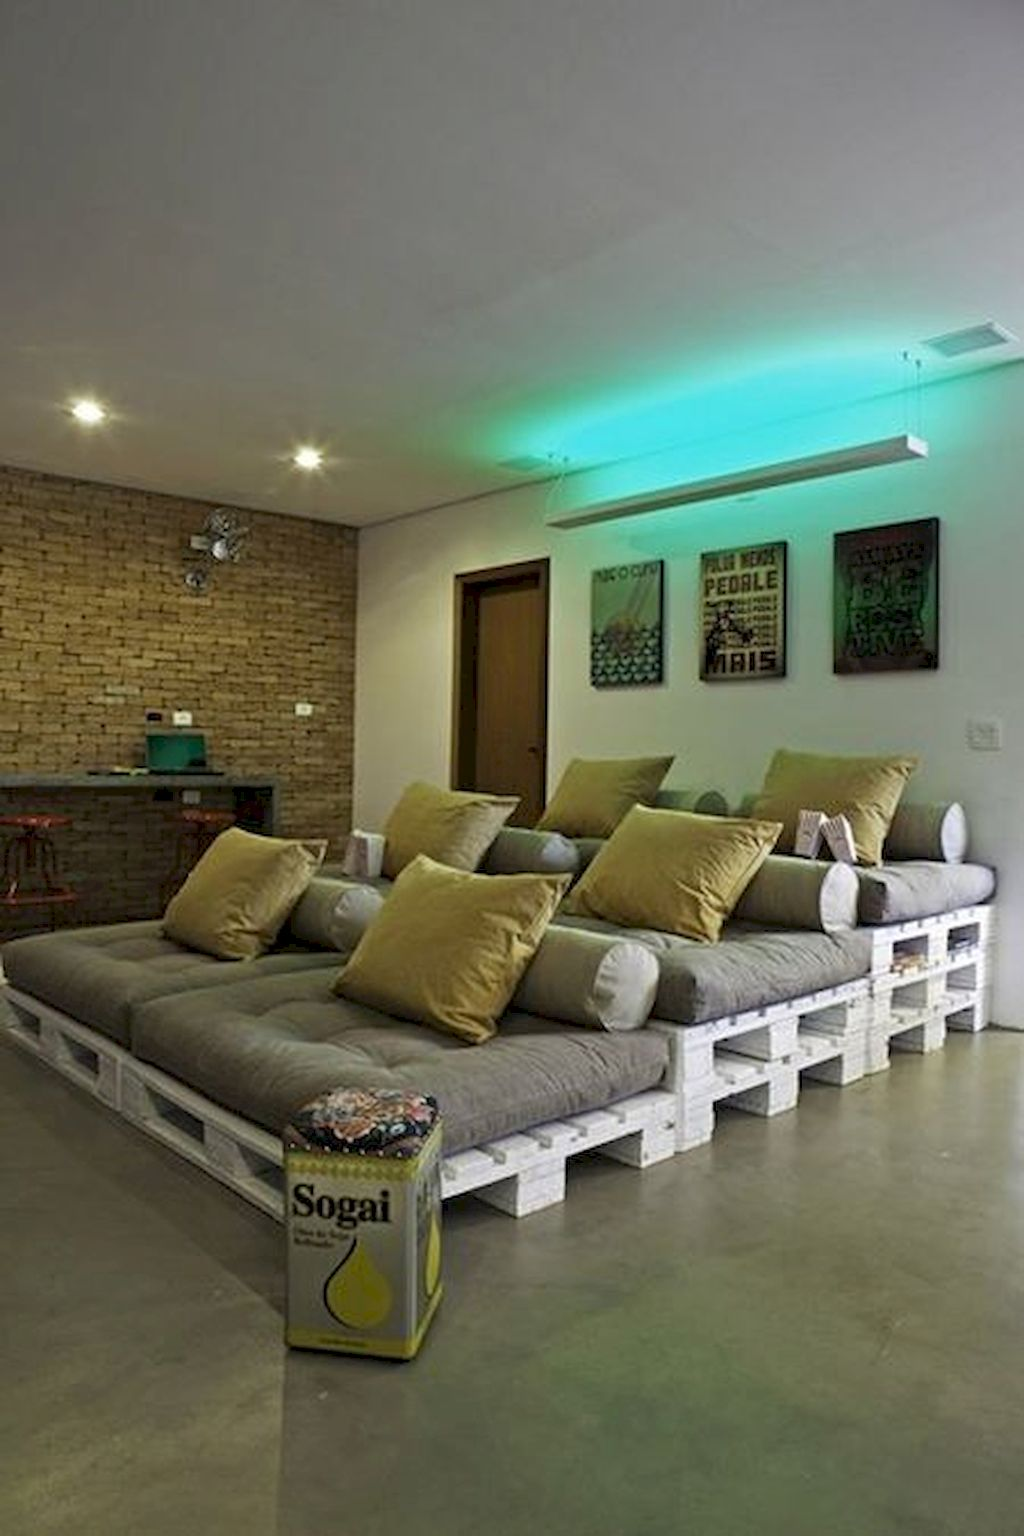 Home Cinema123